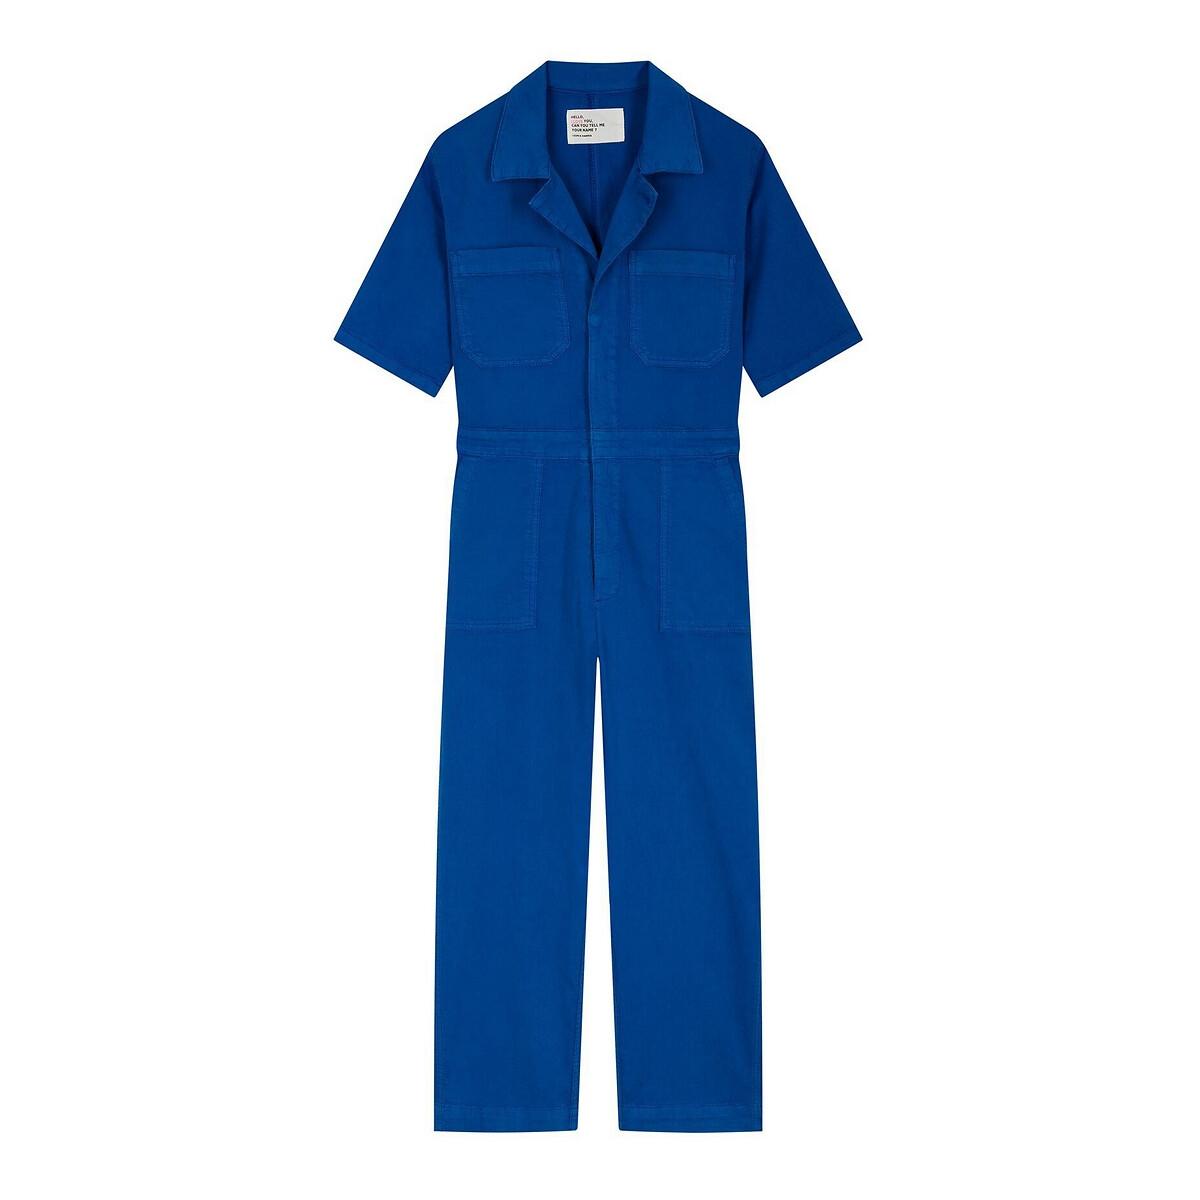 Комбинезон La Redoute С короткими рукавами OZIRIS M синий цена 2017